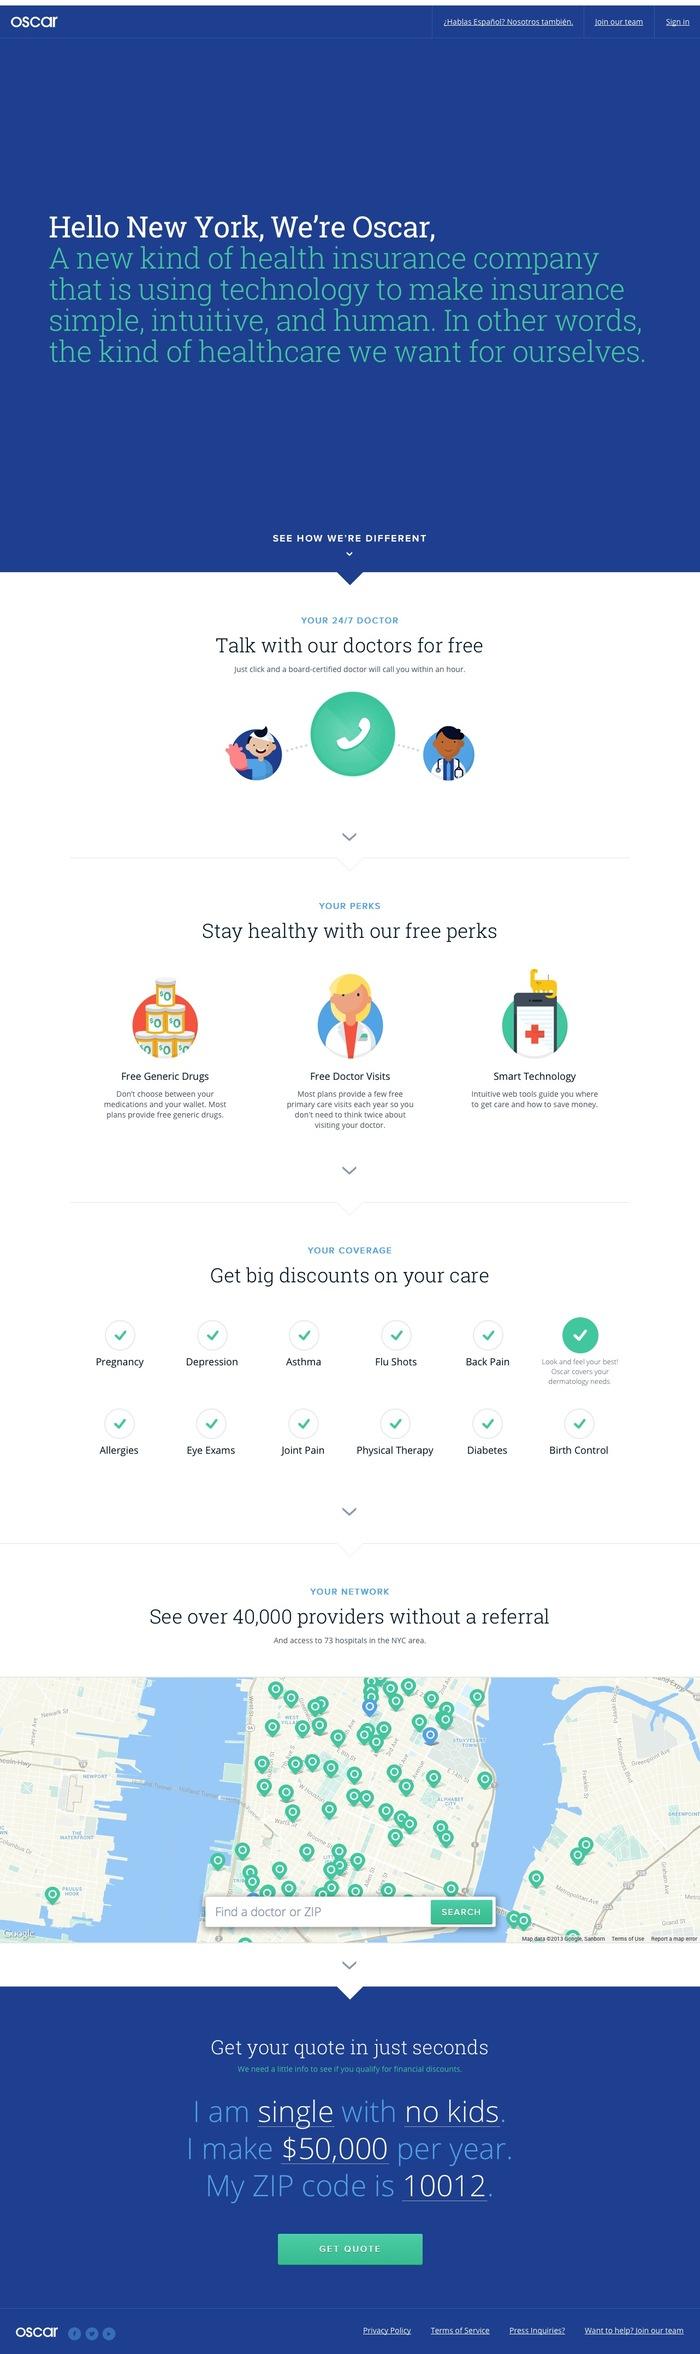 Oscar Health Insurance for New York.jpg